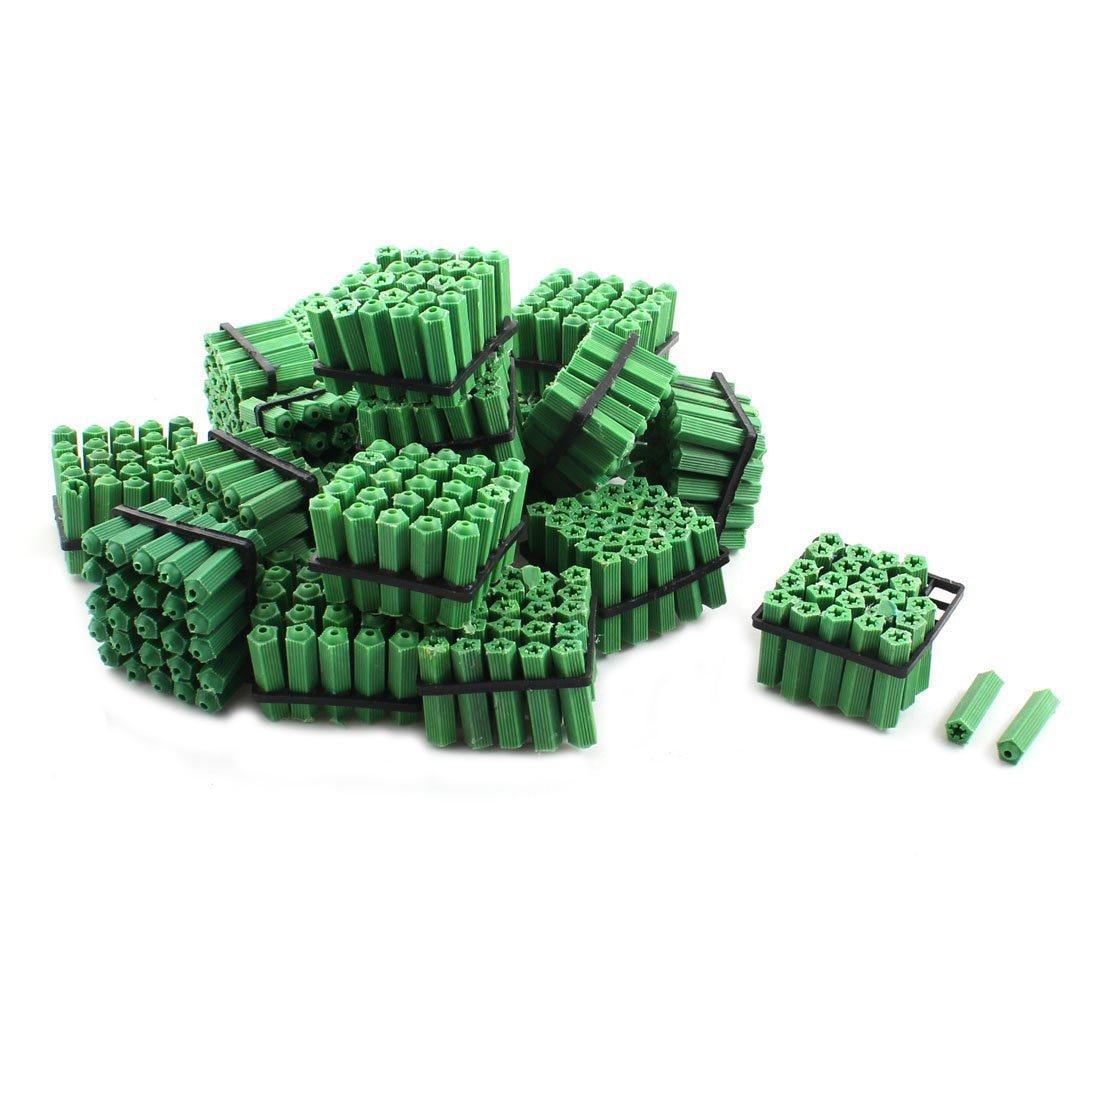 500 Pcs Green Masonry Screw Fixing Wall Anchor Plugs Wall Drywall Plastic Anchor Plastic Wall Plug Masonry Drill Dry Wall Plugs